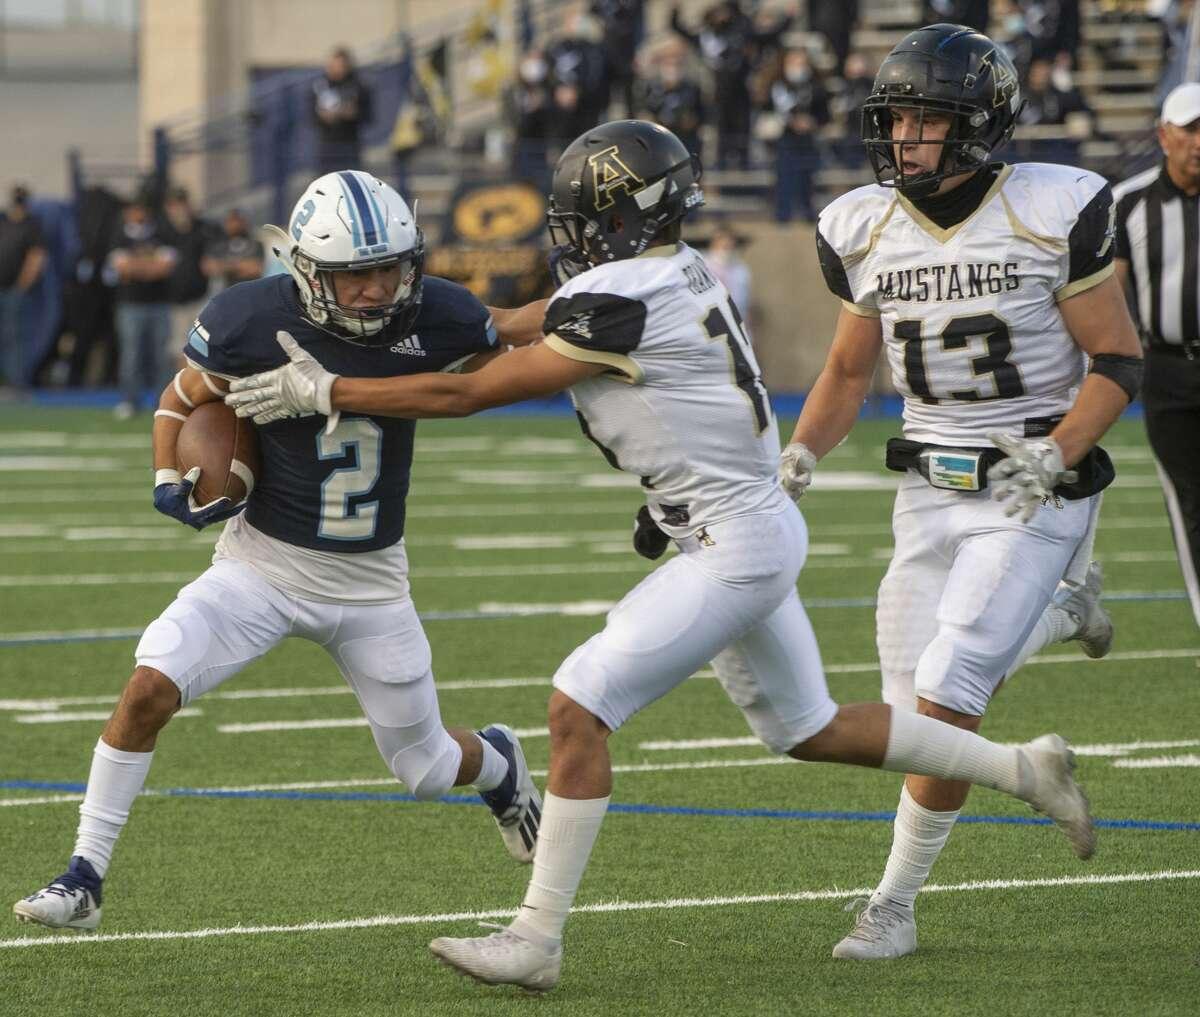 Greenwood's Izaiah Ramirez tries to get away from Andrews' Jose Bustamante and AJ Britten, 13, 09/11/2020 at Grande Communications Stadium. Tim Fischer/Reporter-Telegram